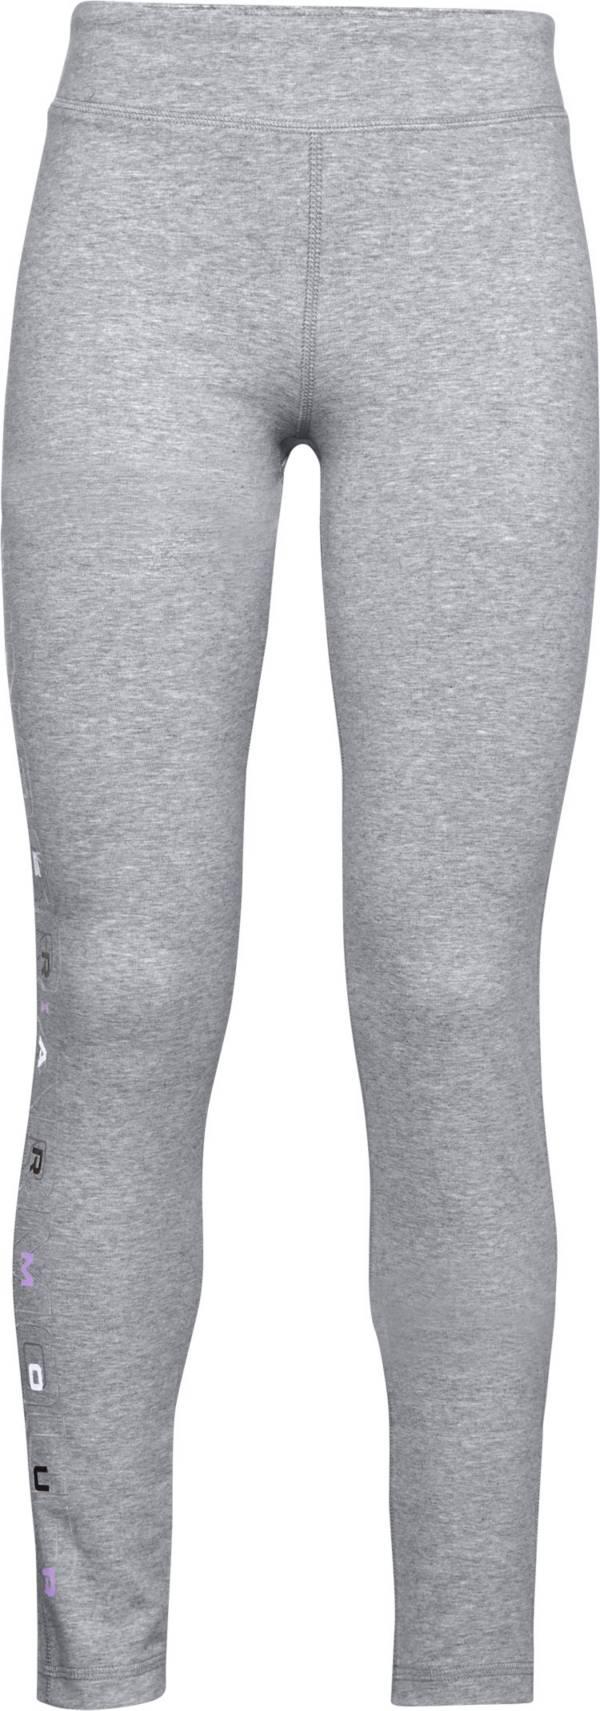 Under Armour Girls' Favorites Leggings product image